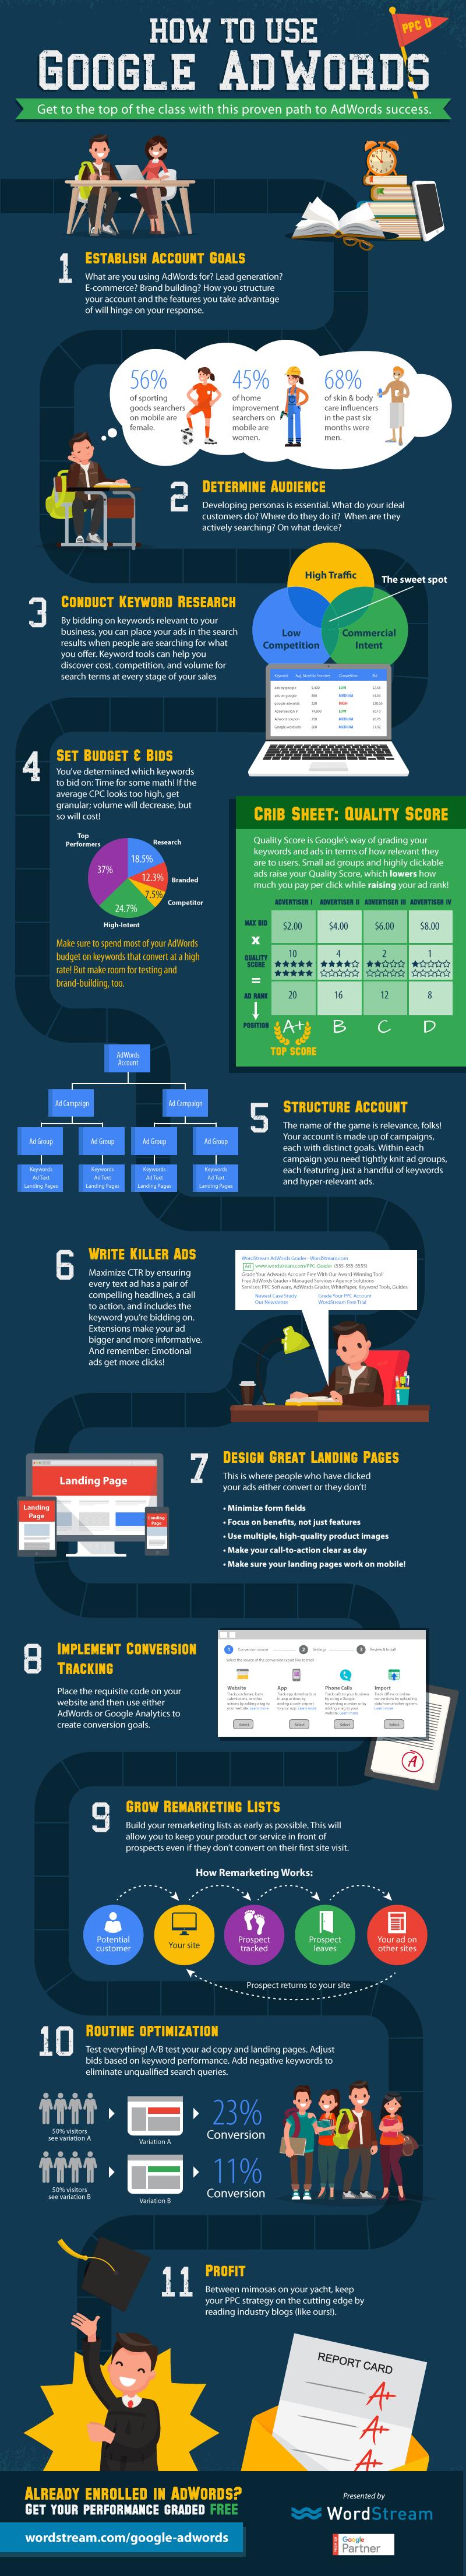 Infographie: Google AdWords, mode d'emploi